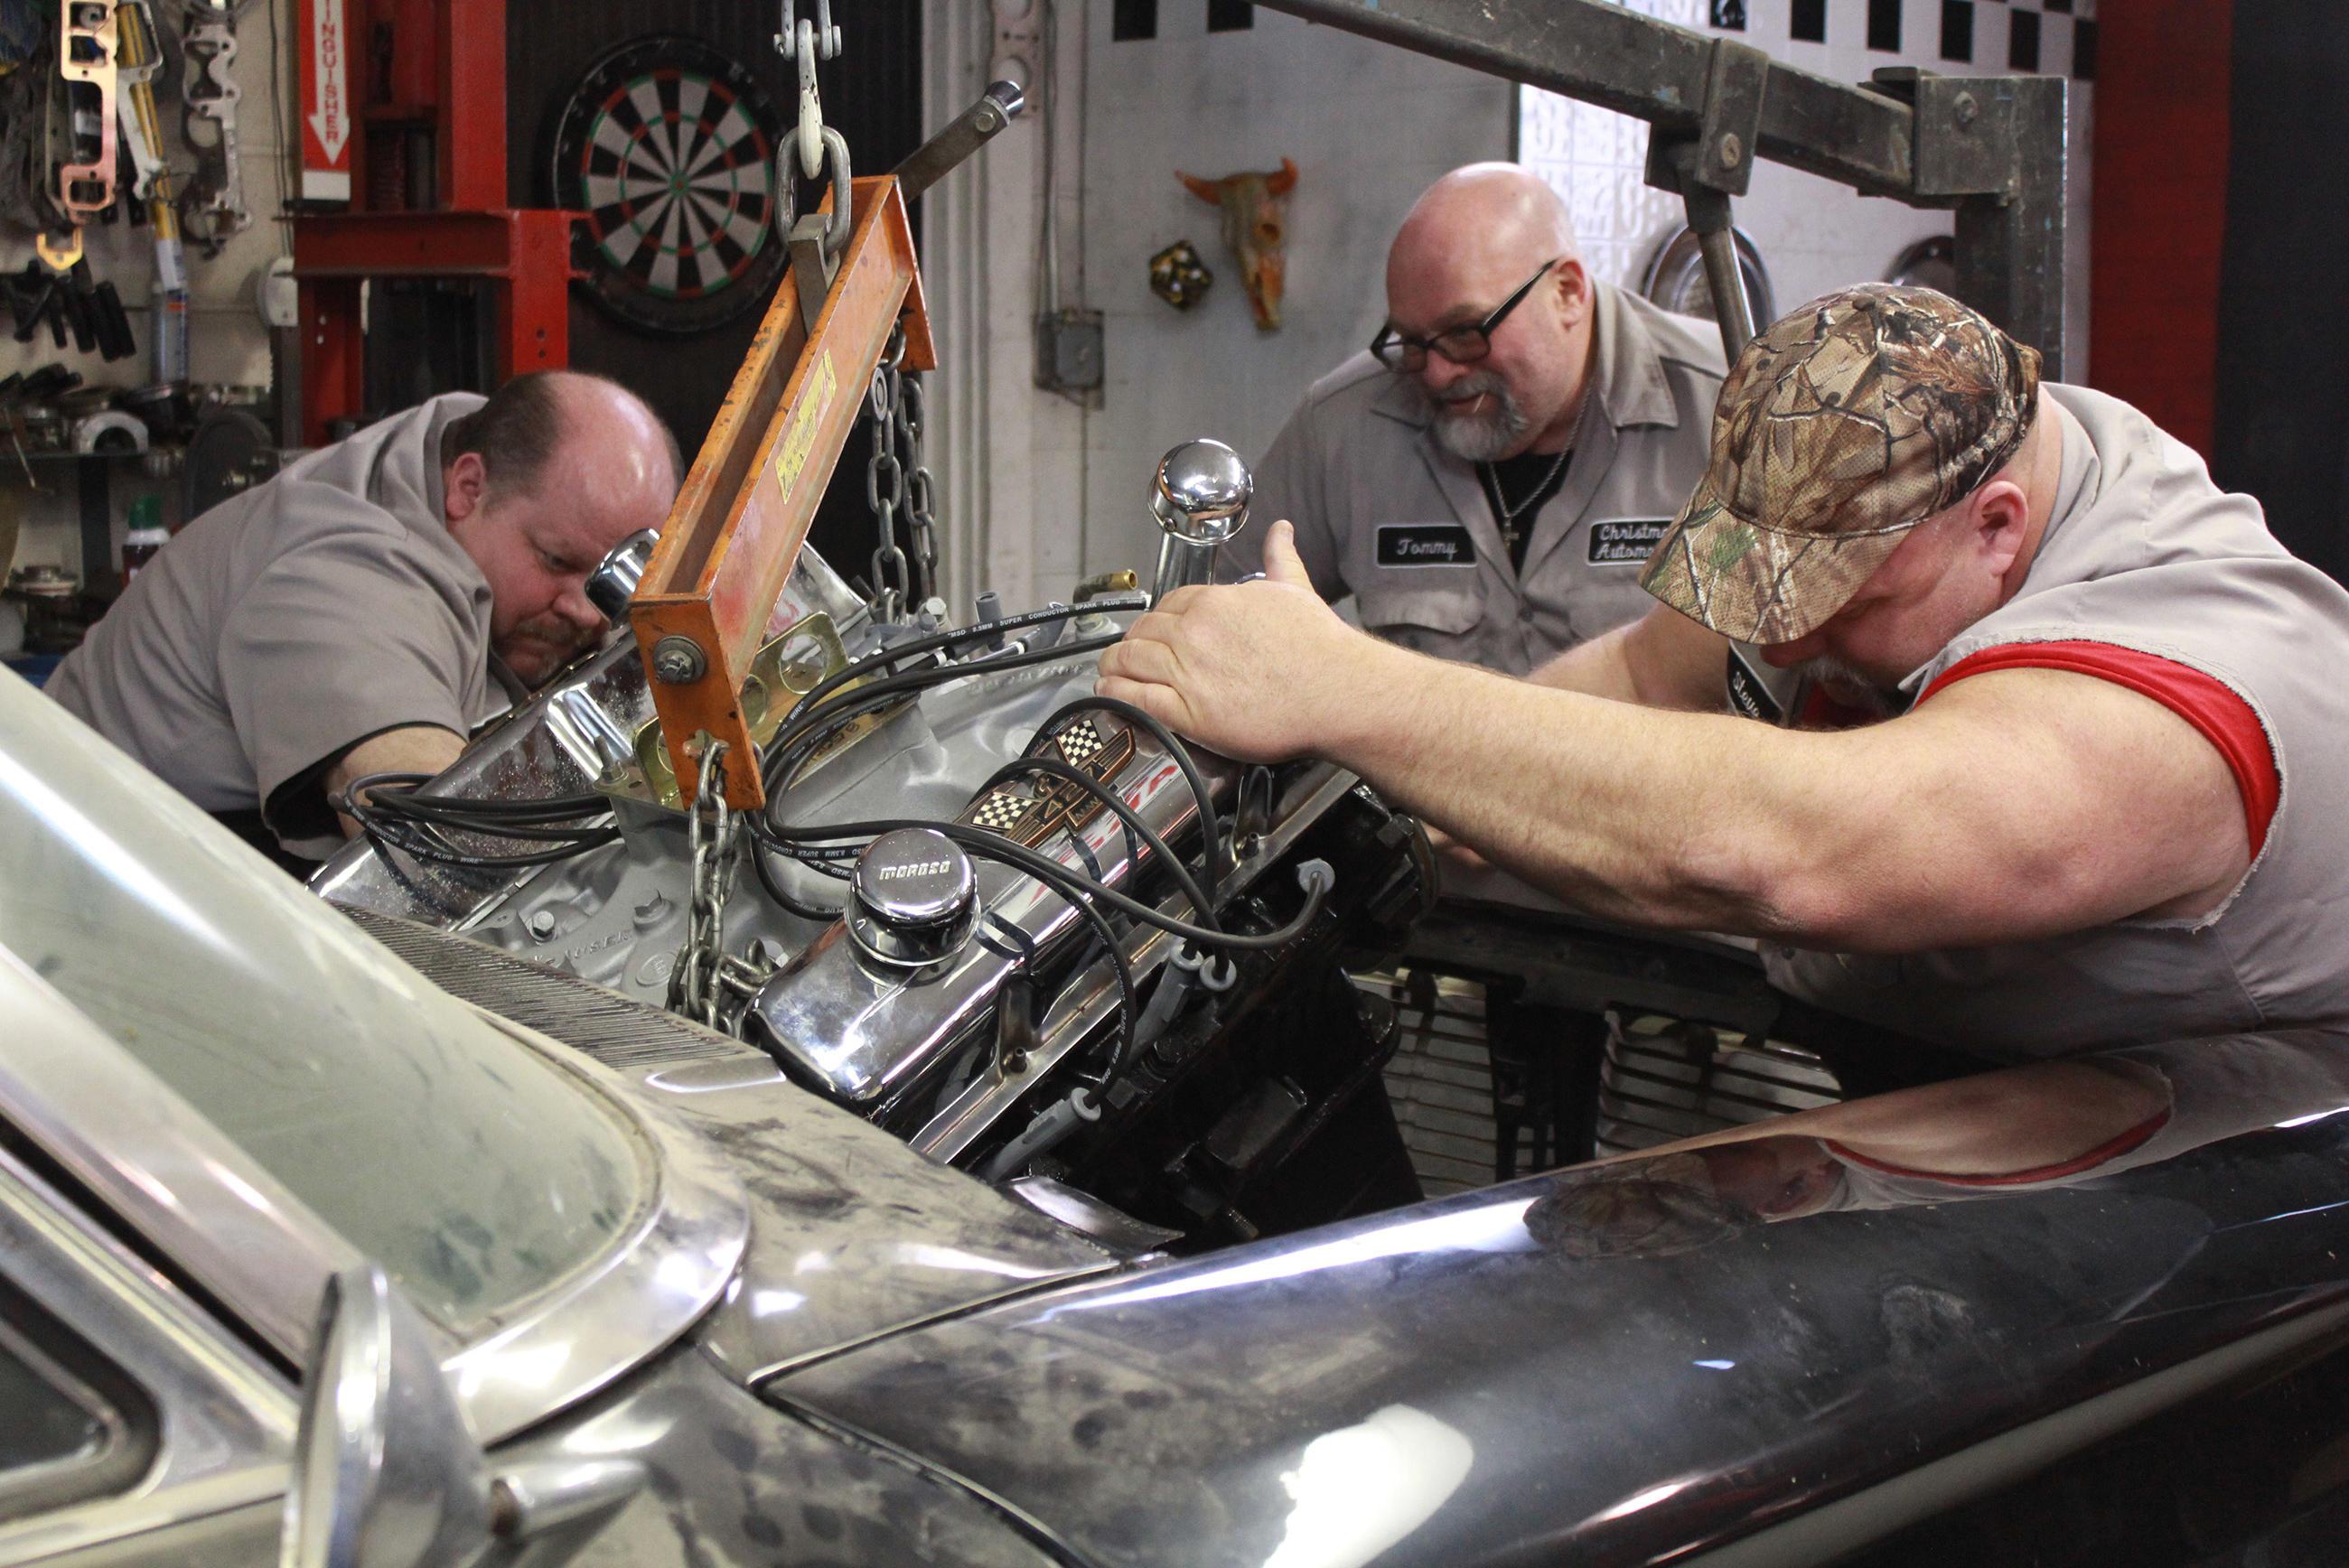 chuck kountz tommy christmas and steve mcgranahan installing a new hemi engine - Tommy Christmas